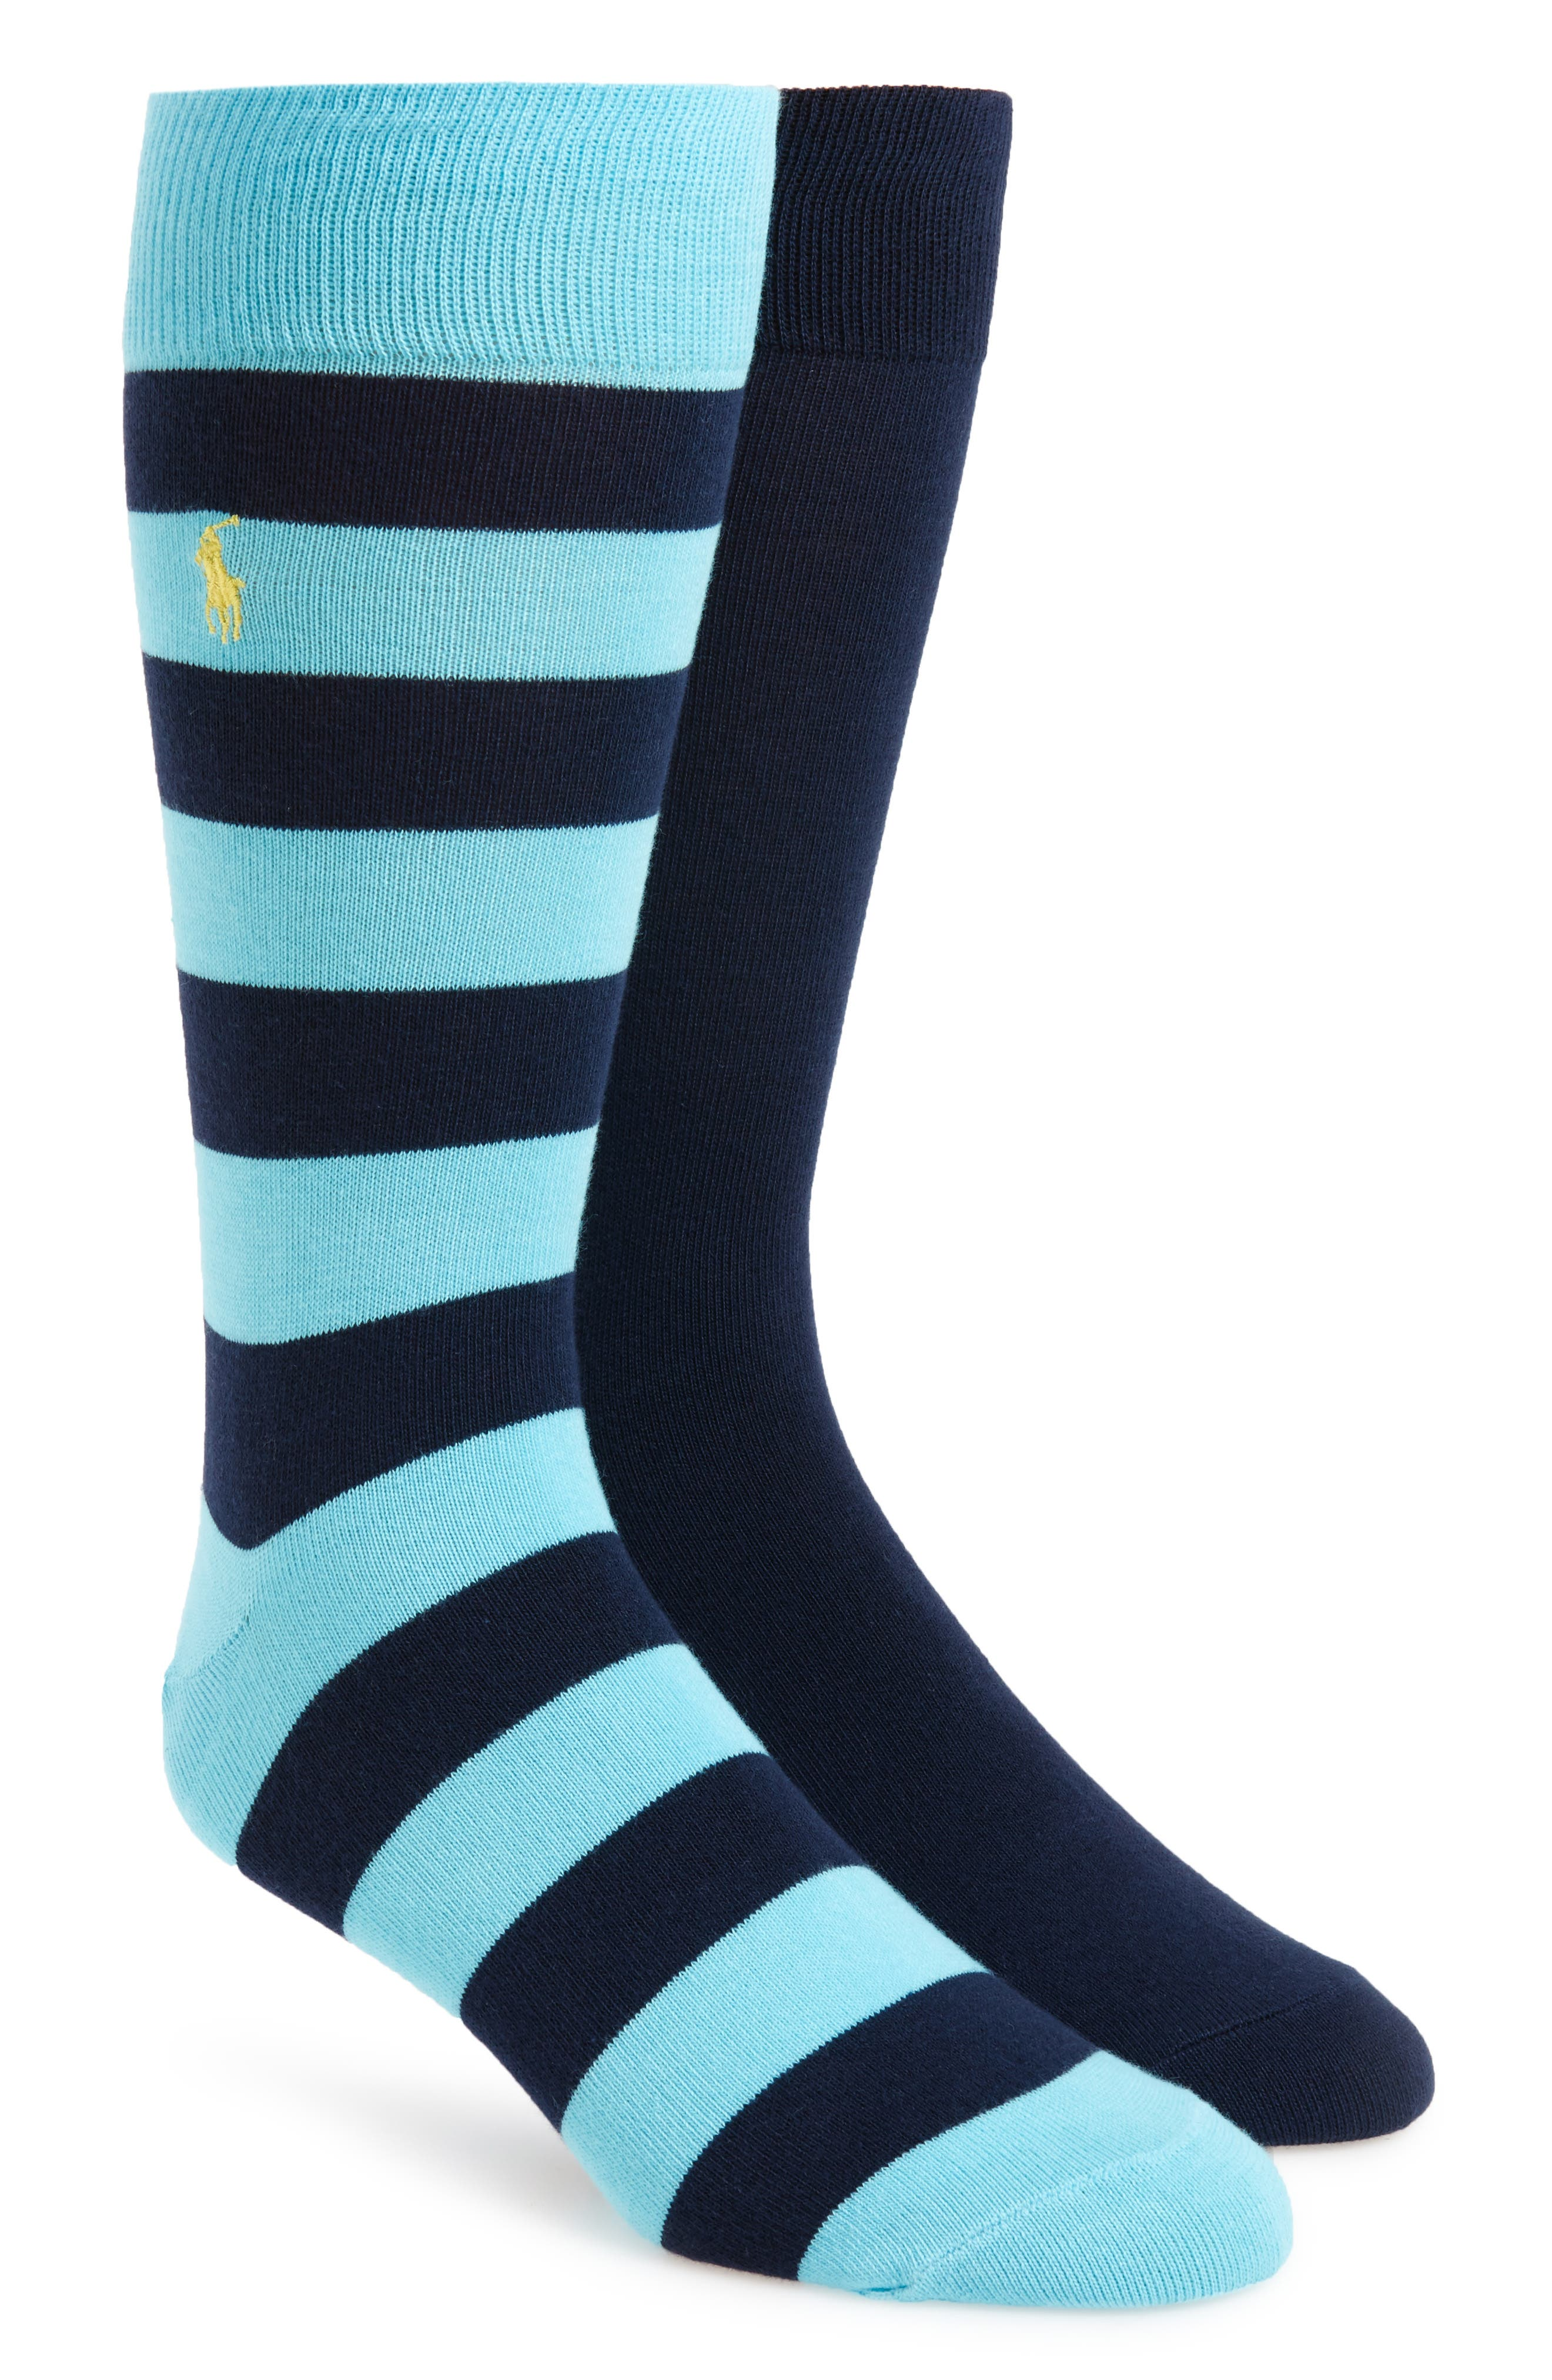 Cotton Blend Socks,                             Main thumbnail 14, color,